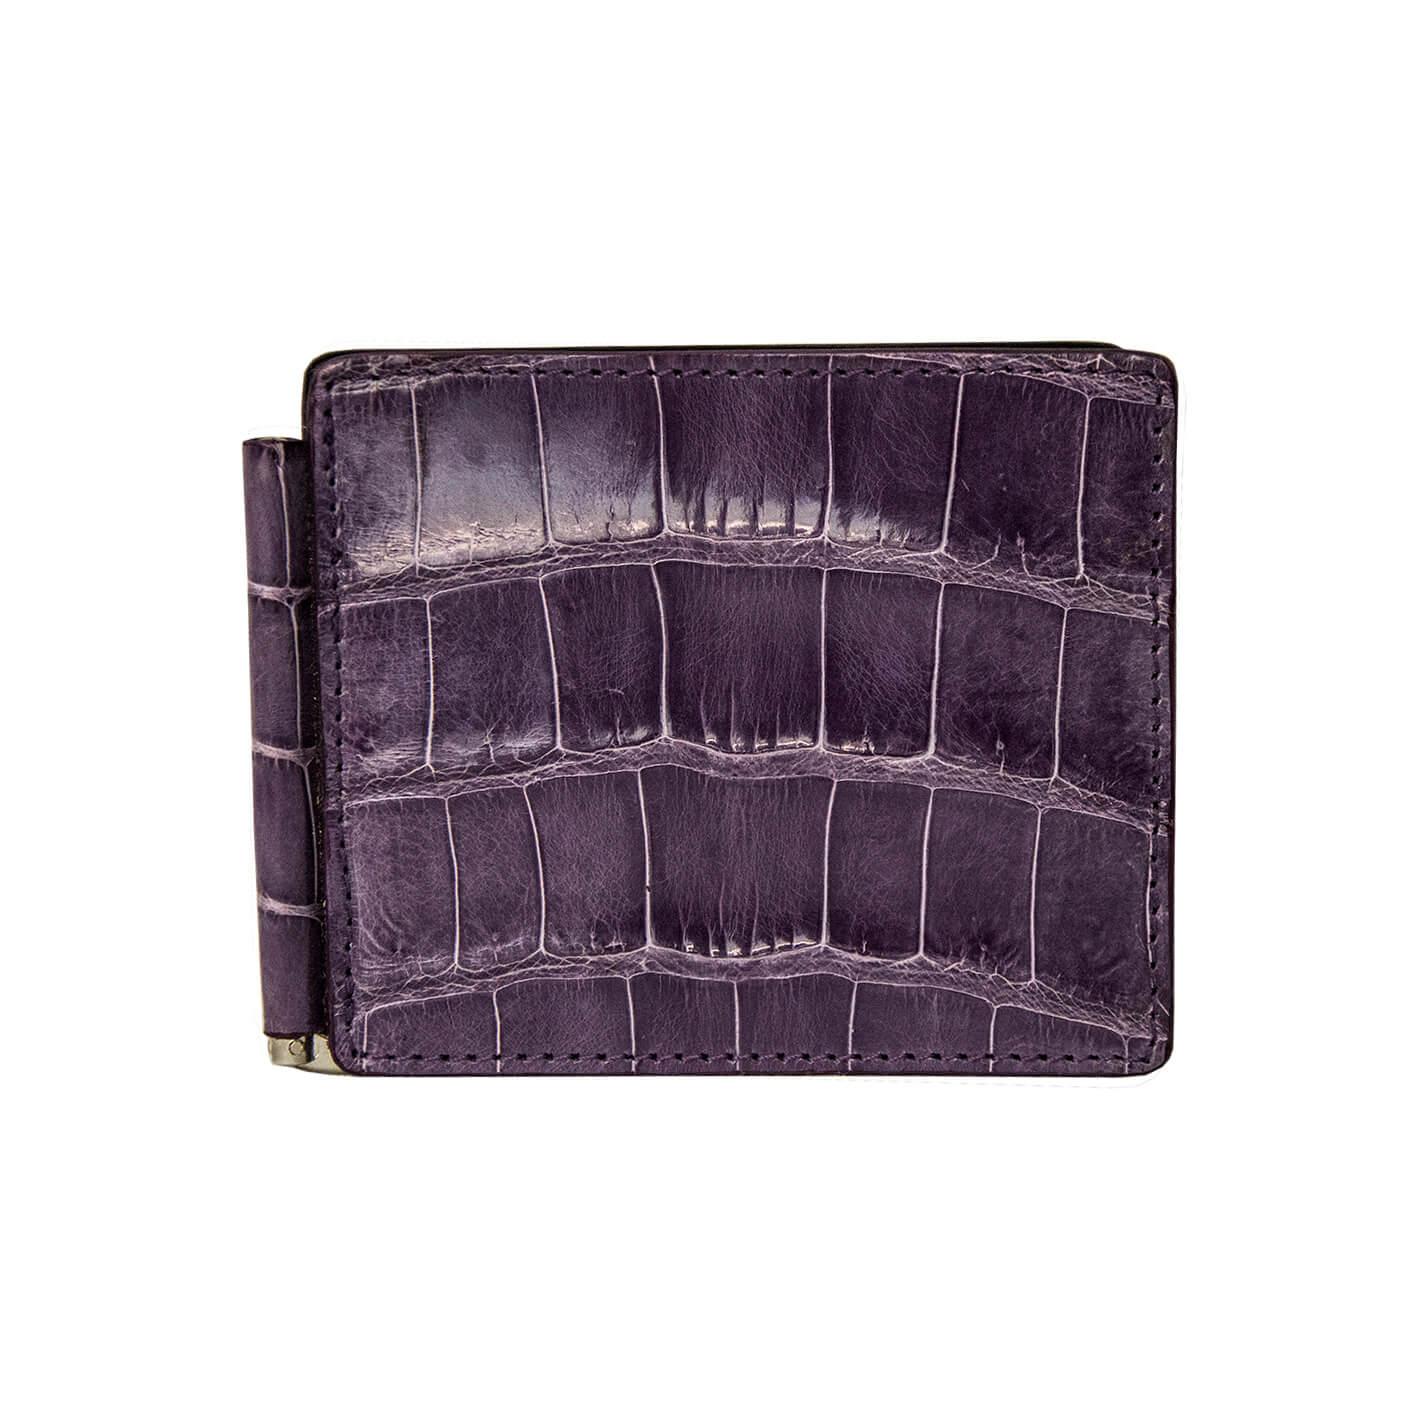 portafoglio uomo coccodrillo viola -portadollari